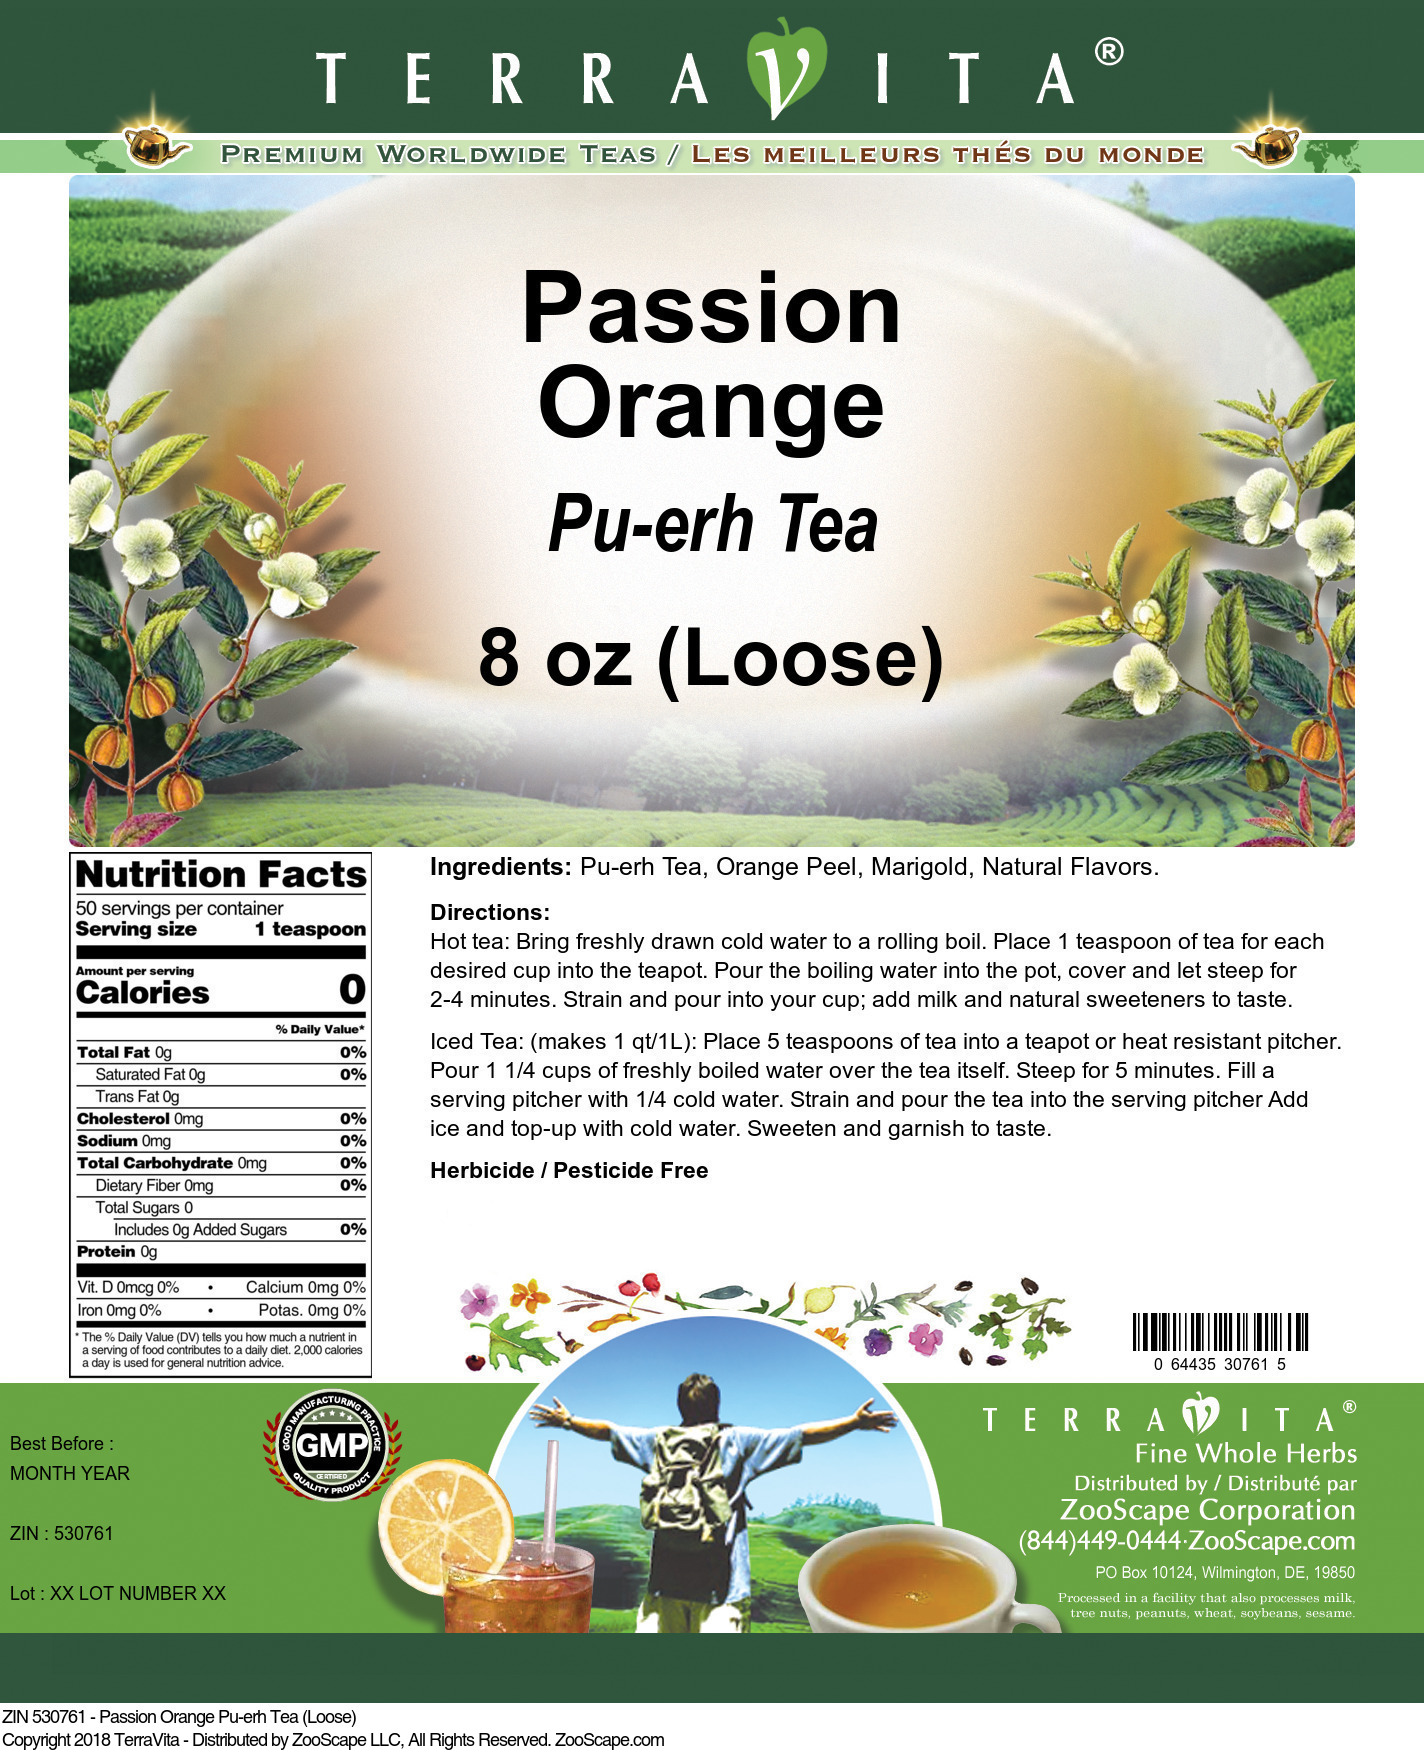 Passion Orange Pu-erh Tea